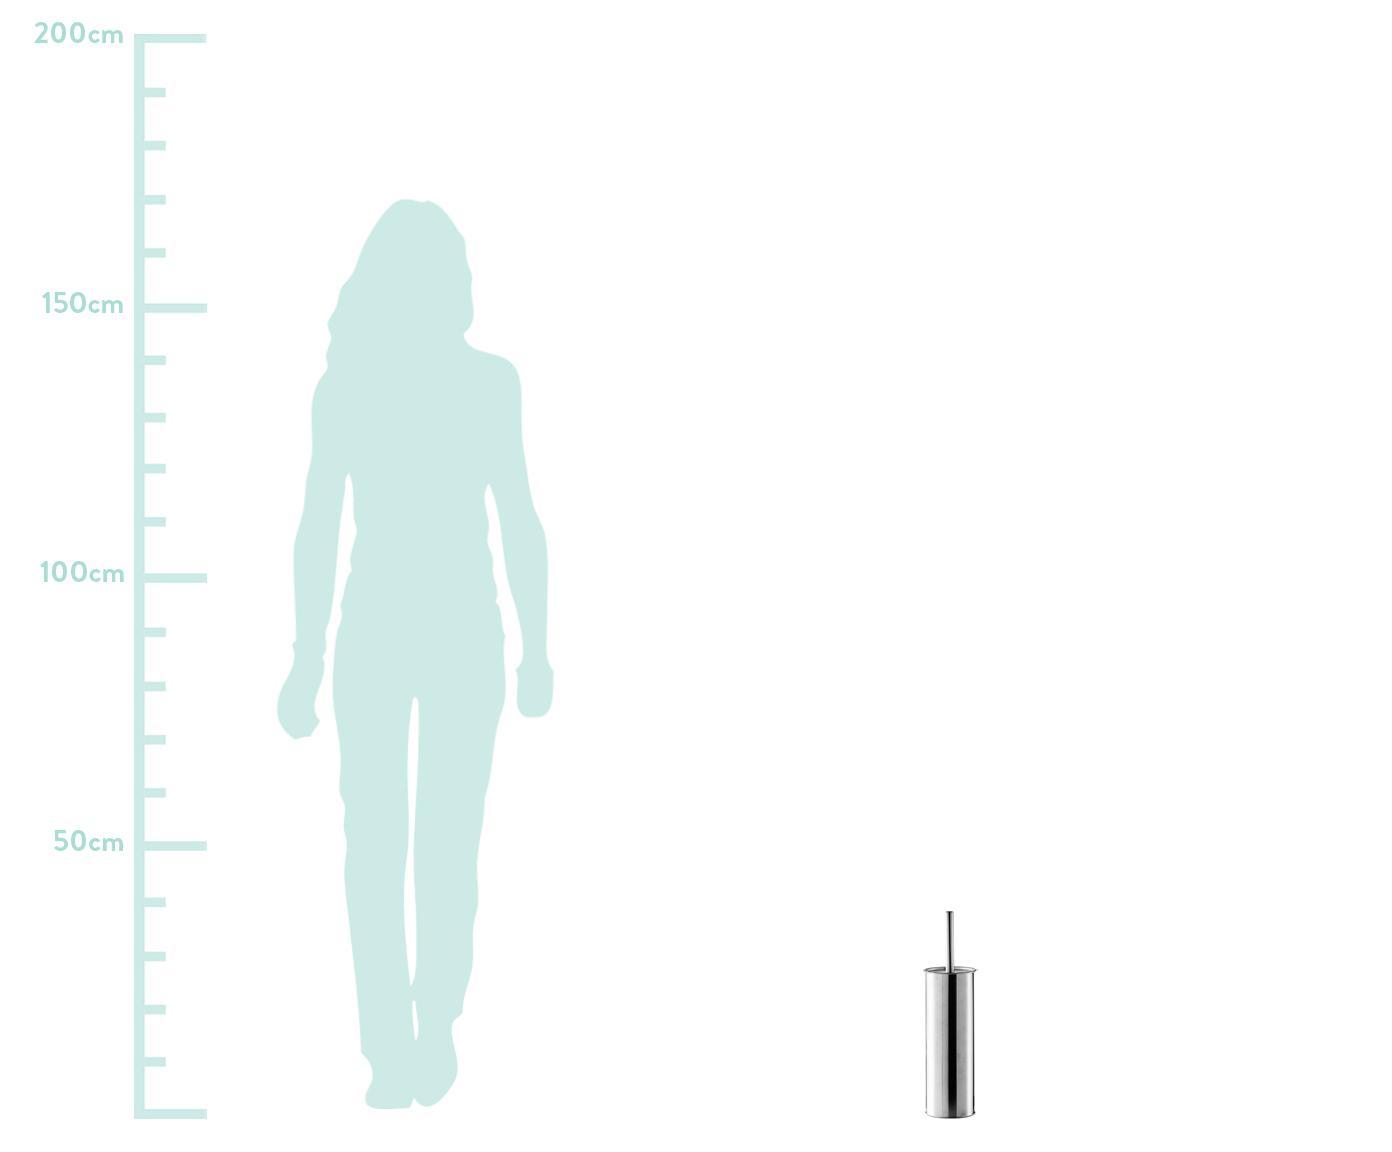 Toilettenbürste Classic mit Edelstahl-Behälter, Gefäß: Edelstahl, Griff: Edelstahl, Edelstahl, Ø 10 x H 38 cm